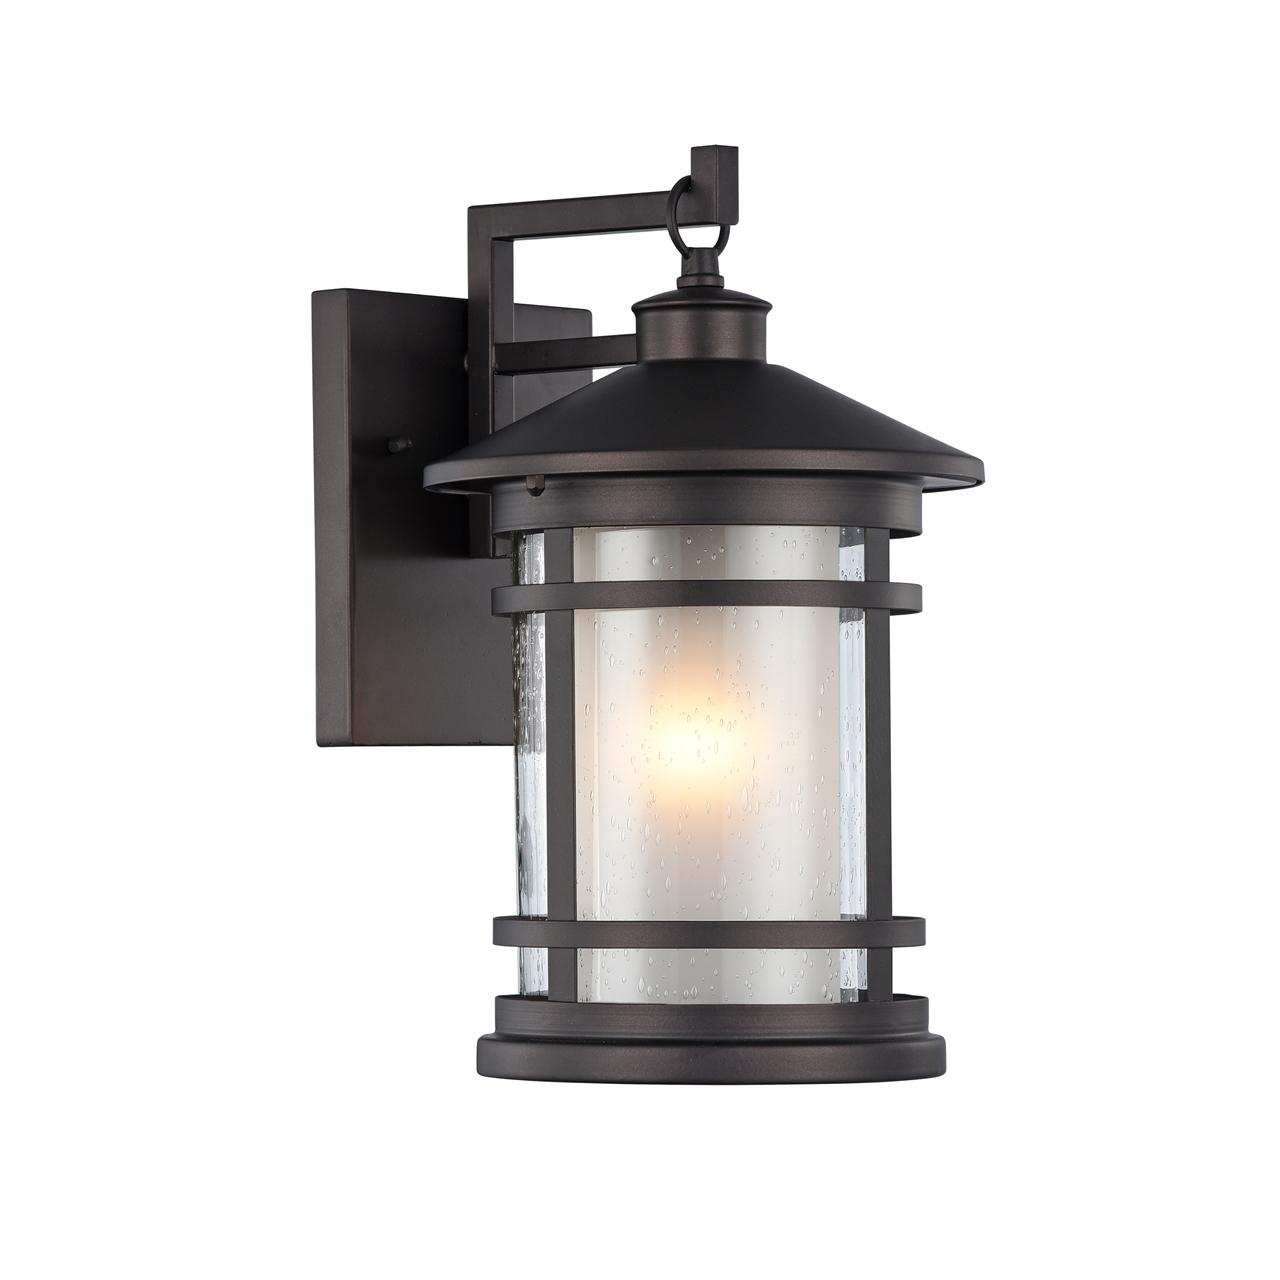 wholesale outdoor lights - 28 images - wholesale outdoor lighting buy wholesale vintage outdoor ...